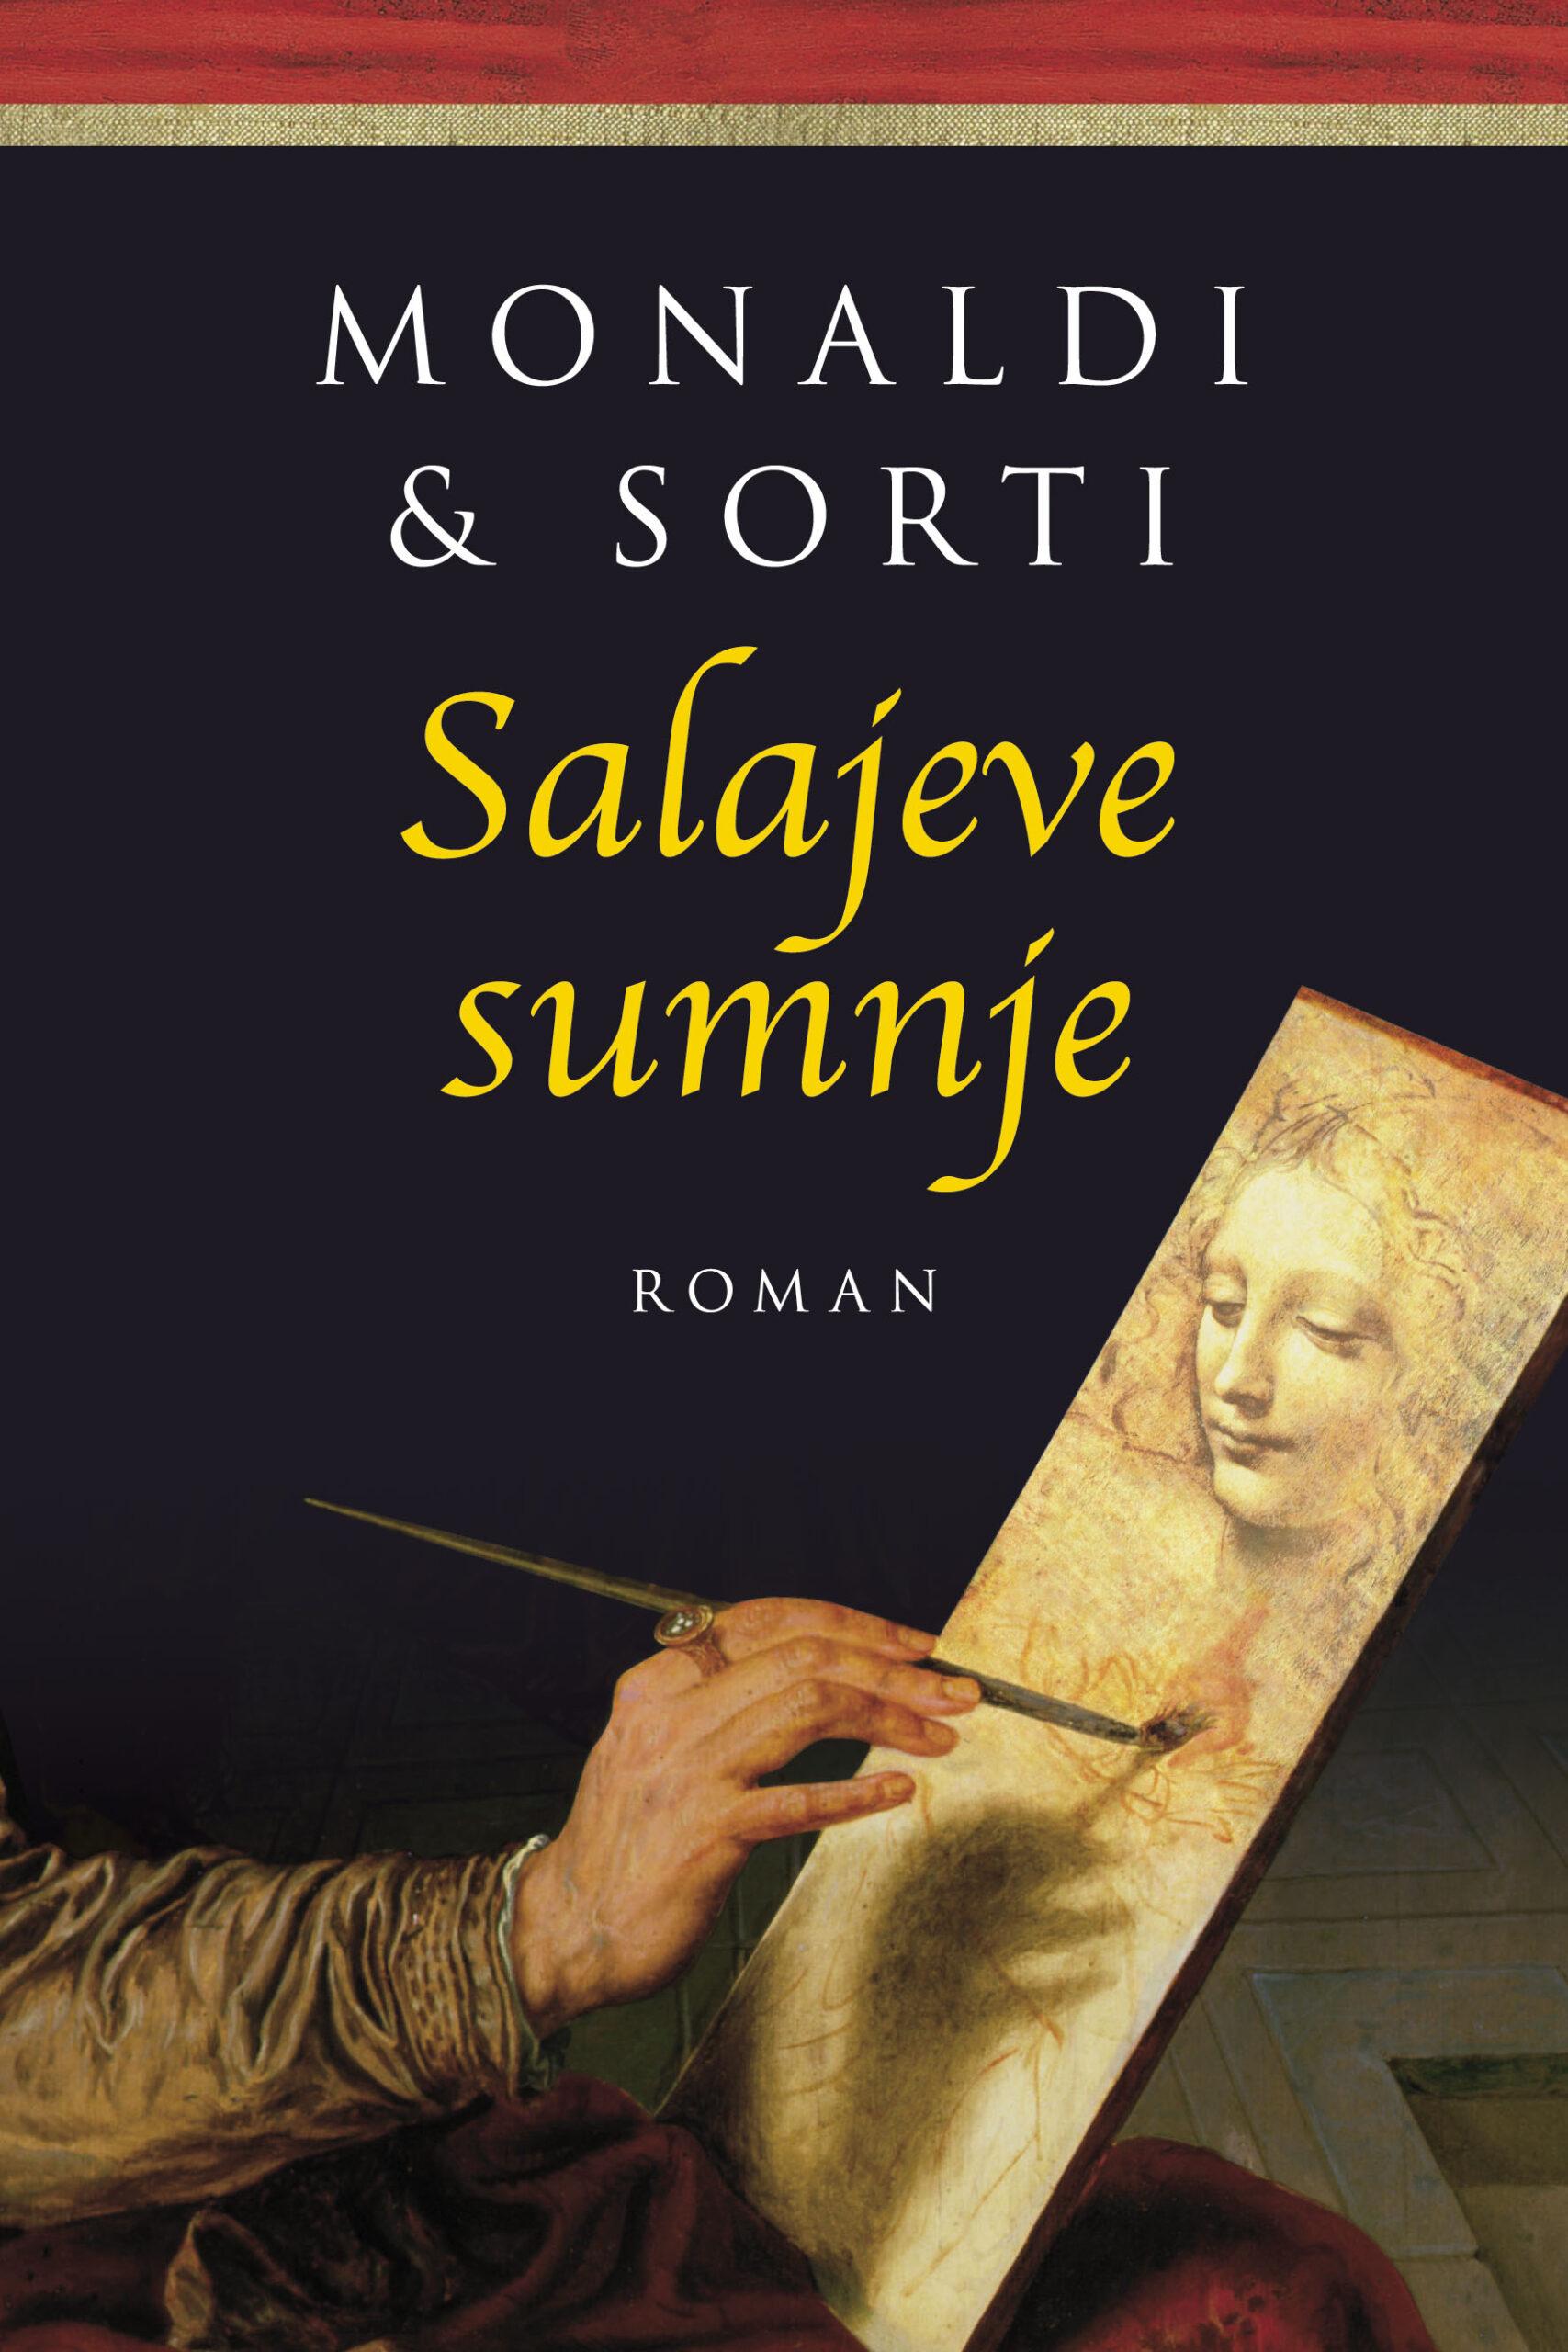 Rita Monaldi, Francesco Sorti: Salajeve sumnje